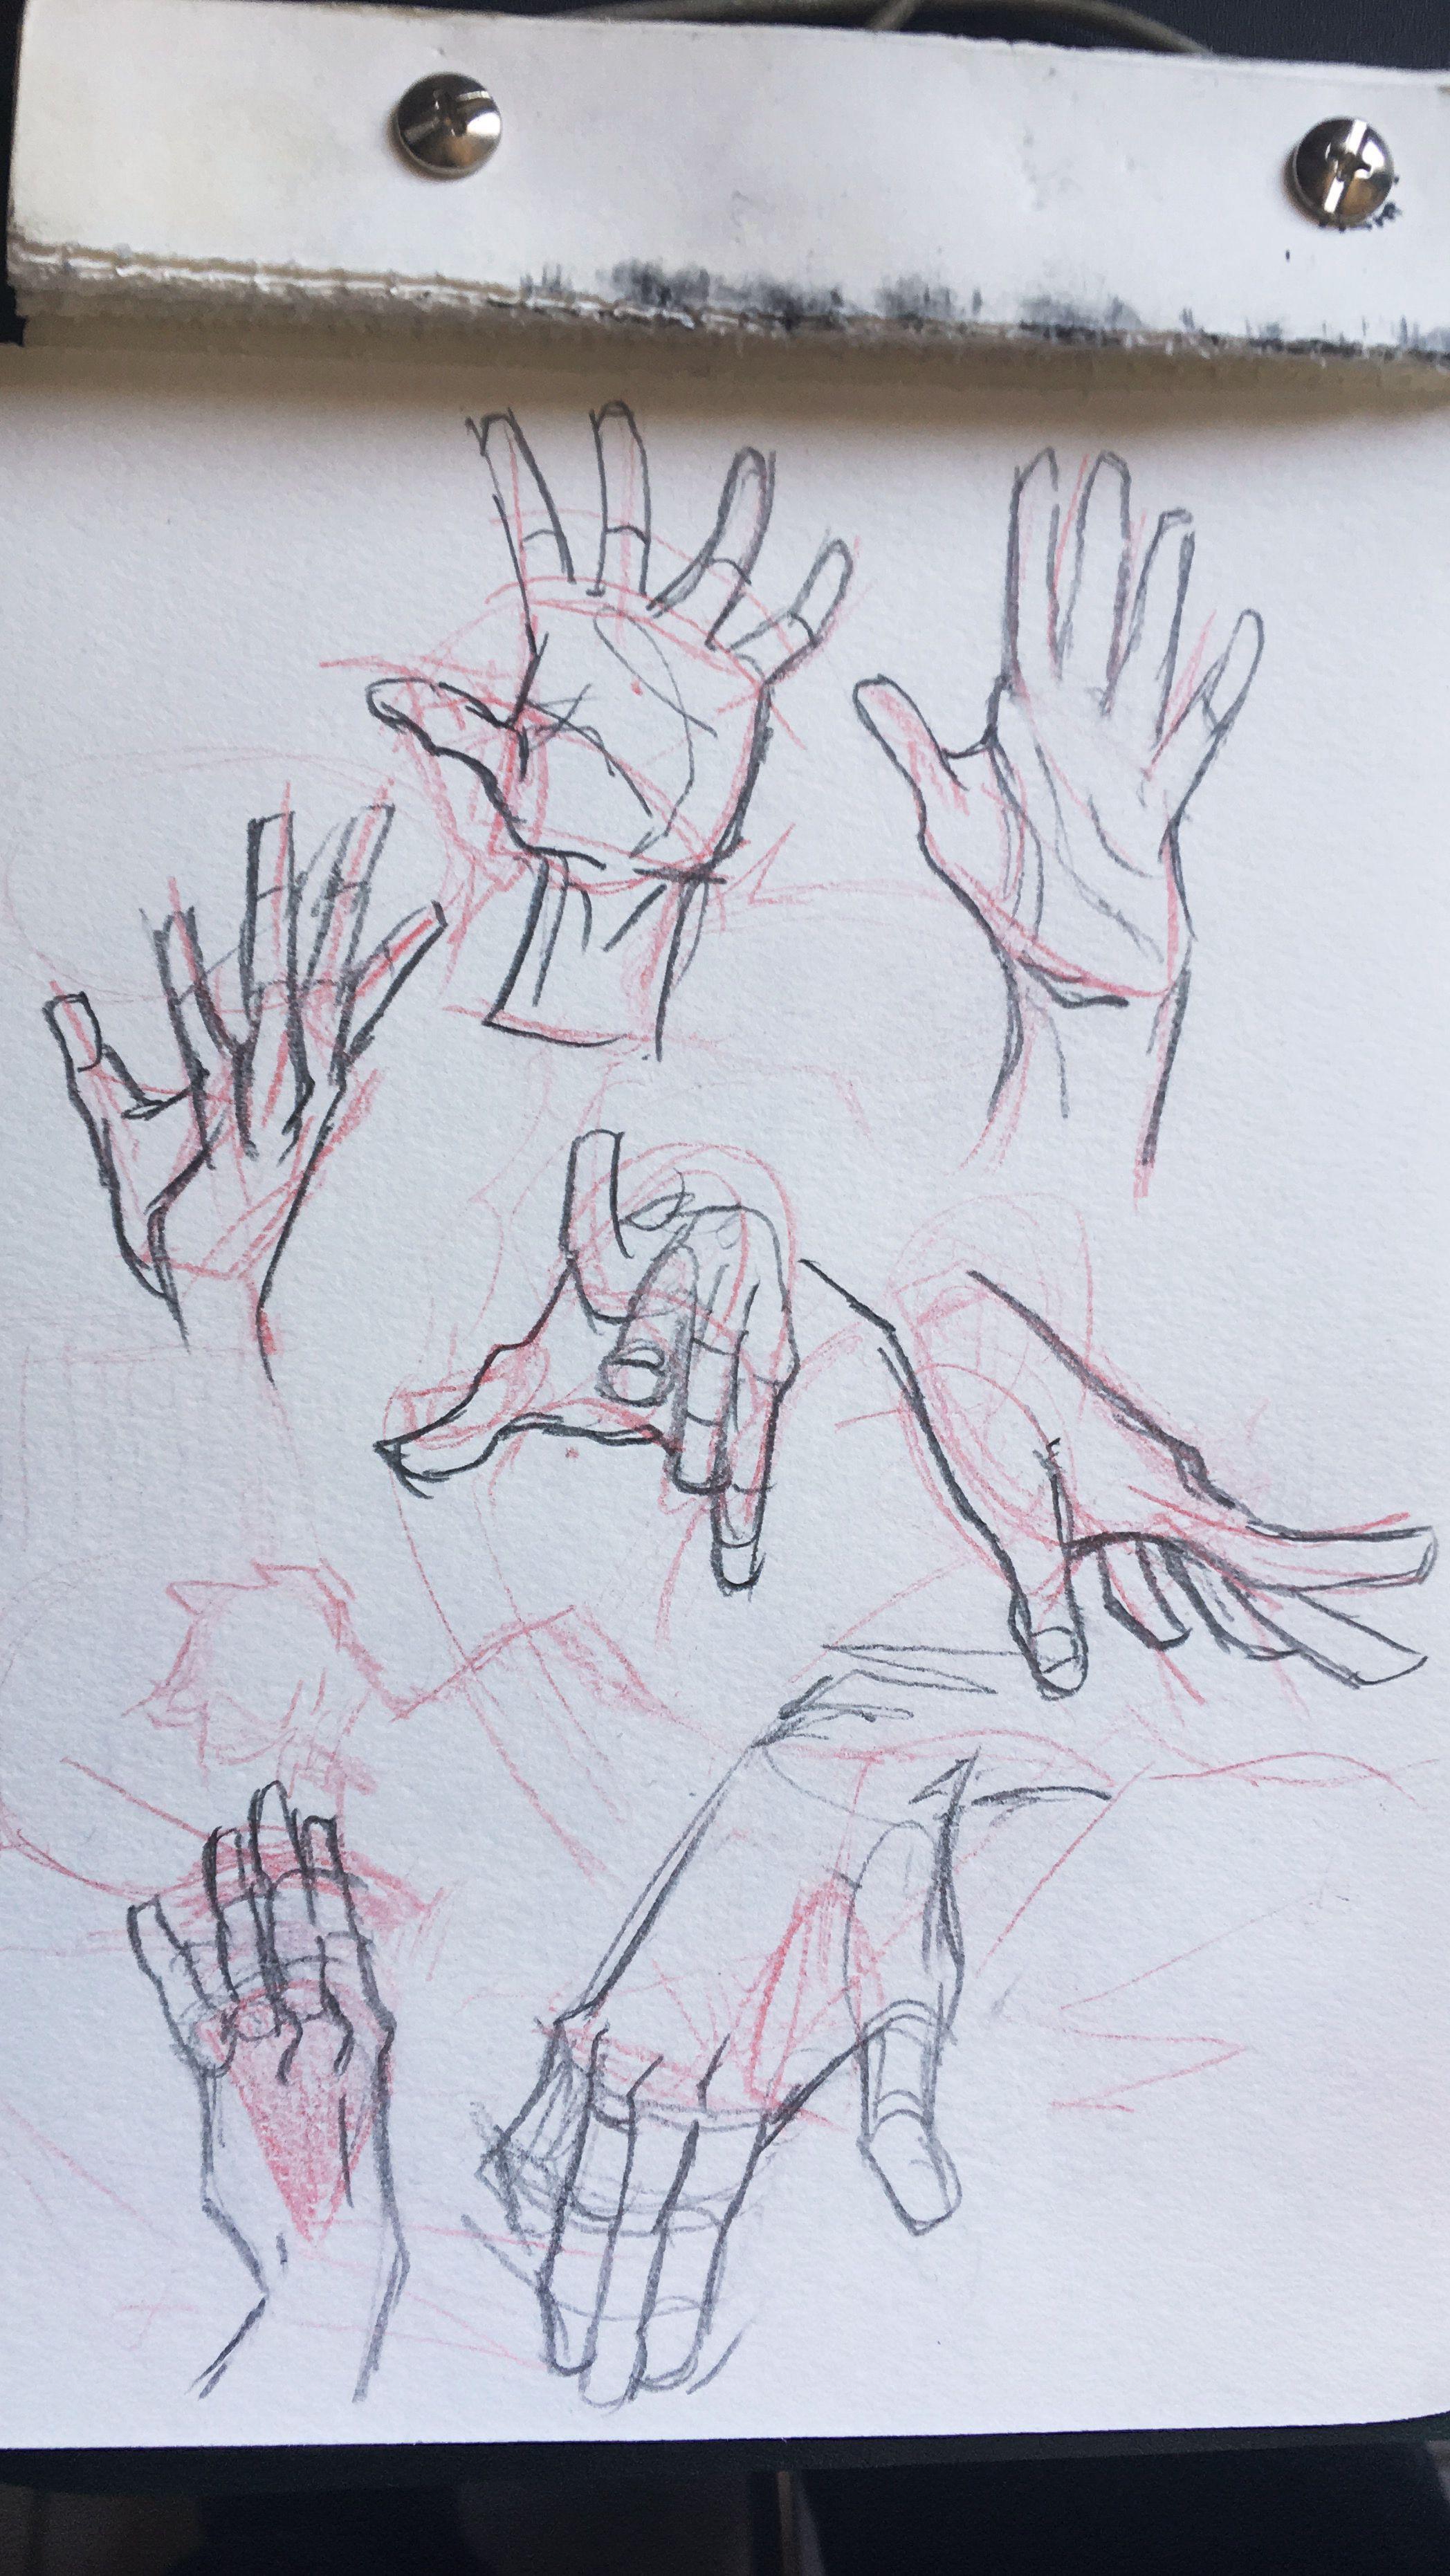 Estudo de mãos | Inspirarte | Anatomia | Pinterest | Anatomía ...